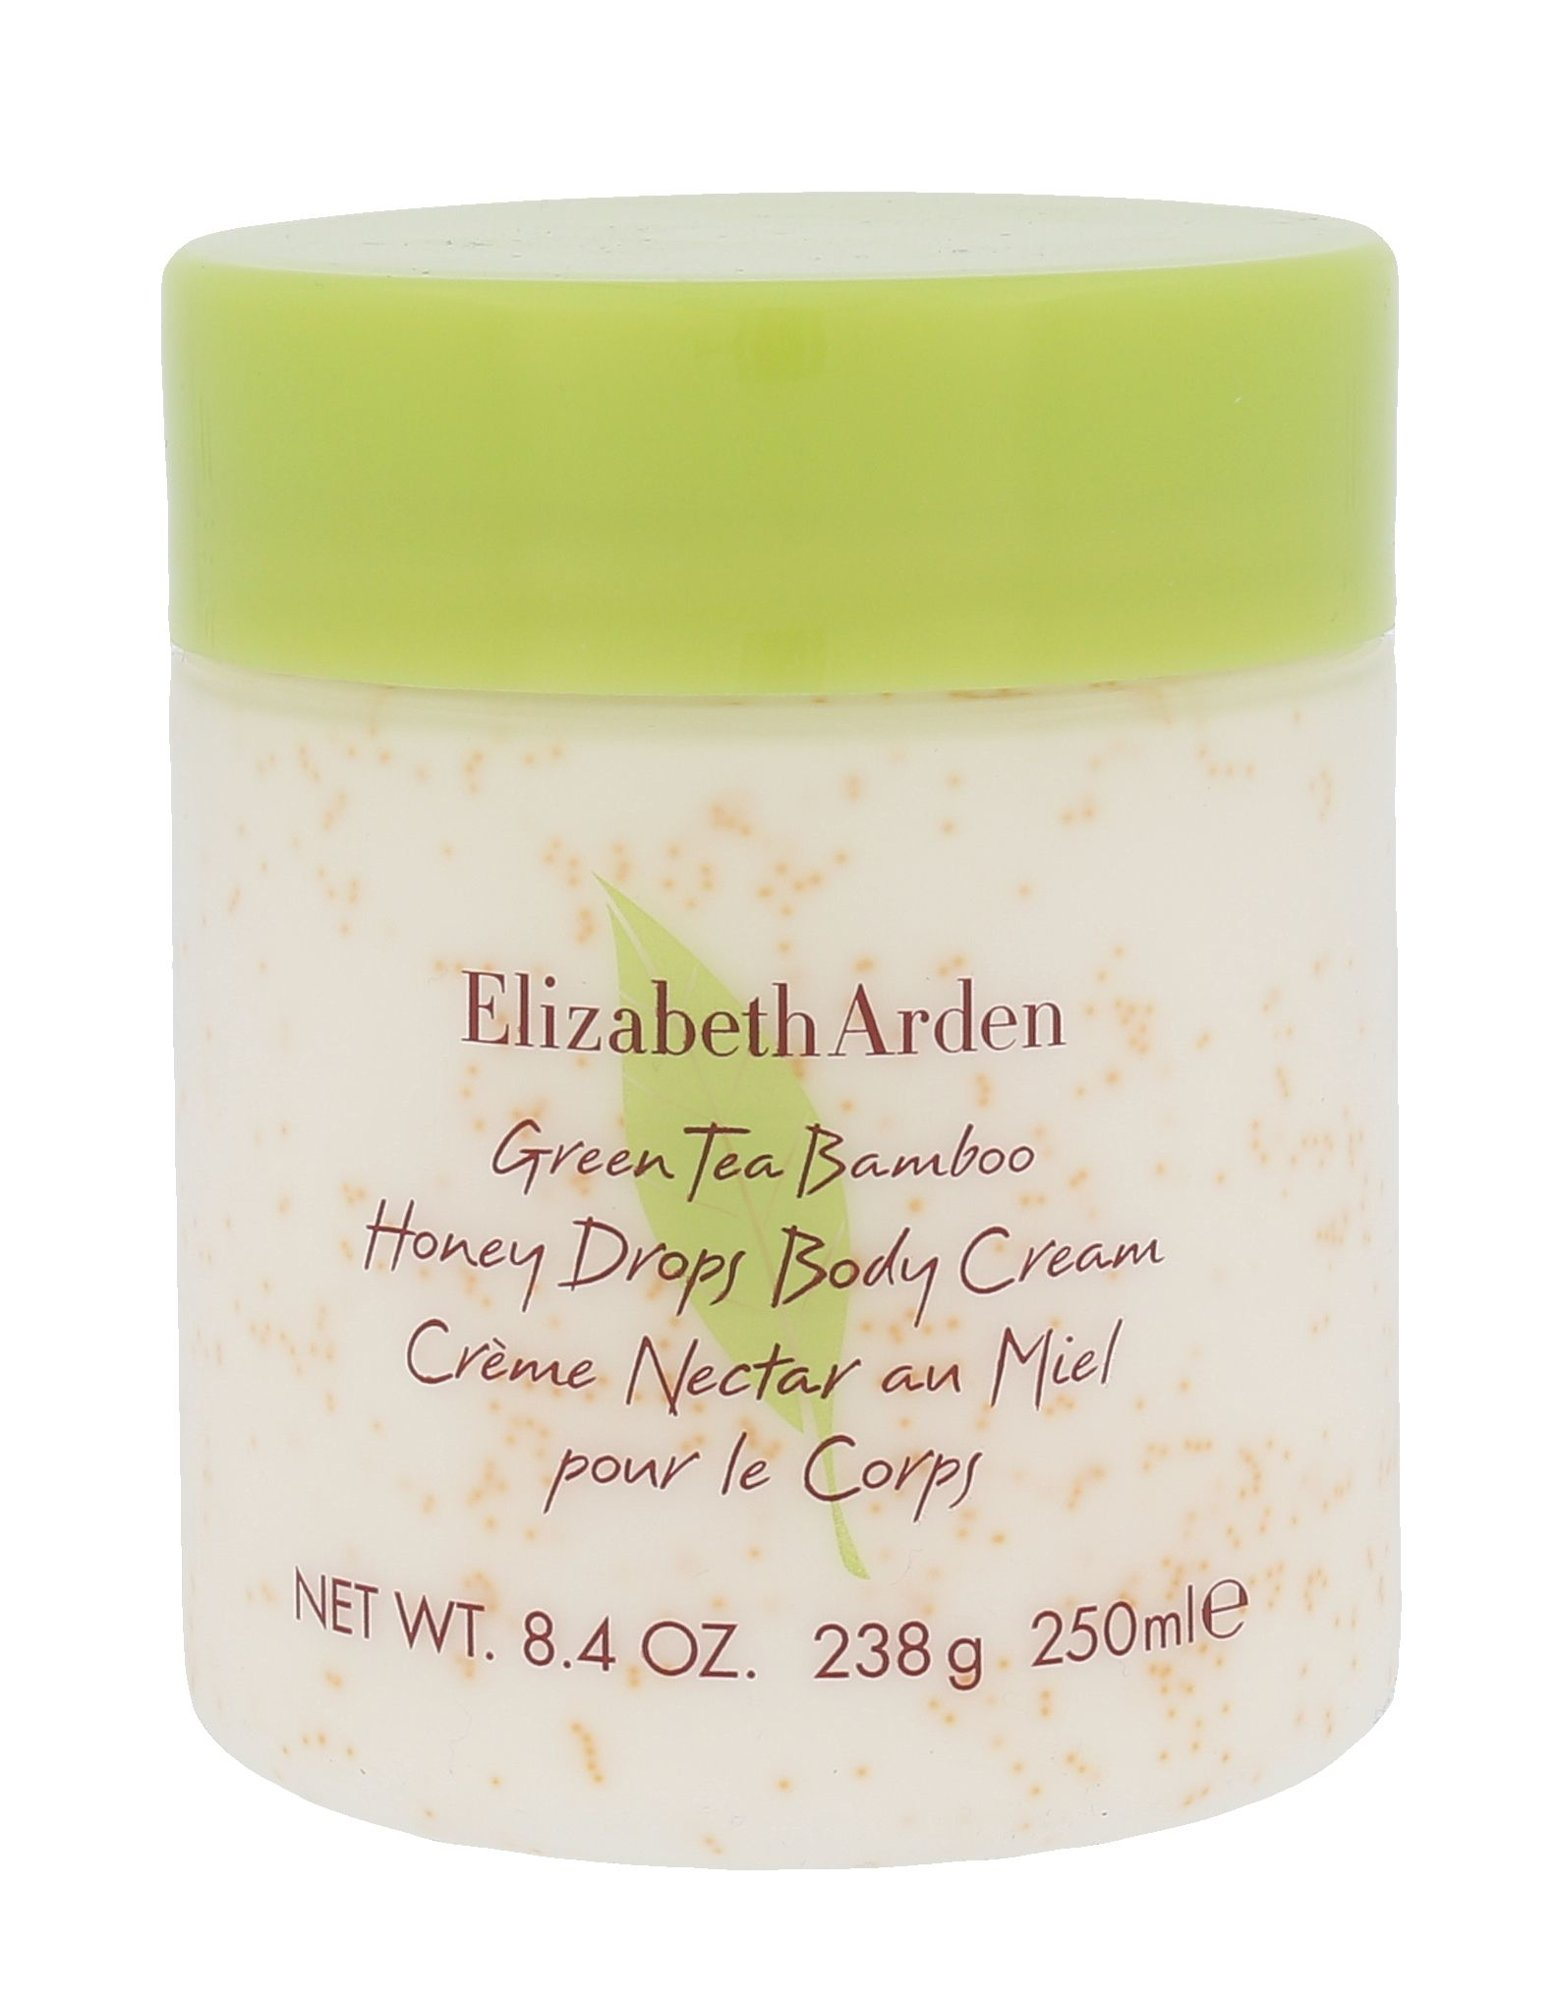 Kūno kremai ir kūno losijonai Elizabeth Arden Green Tea Bamboo